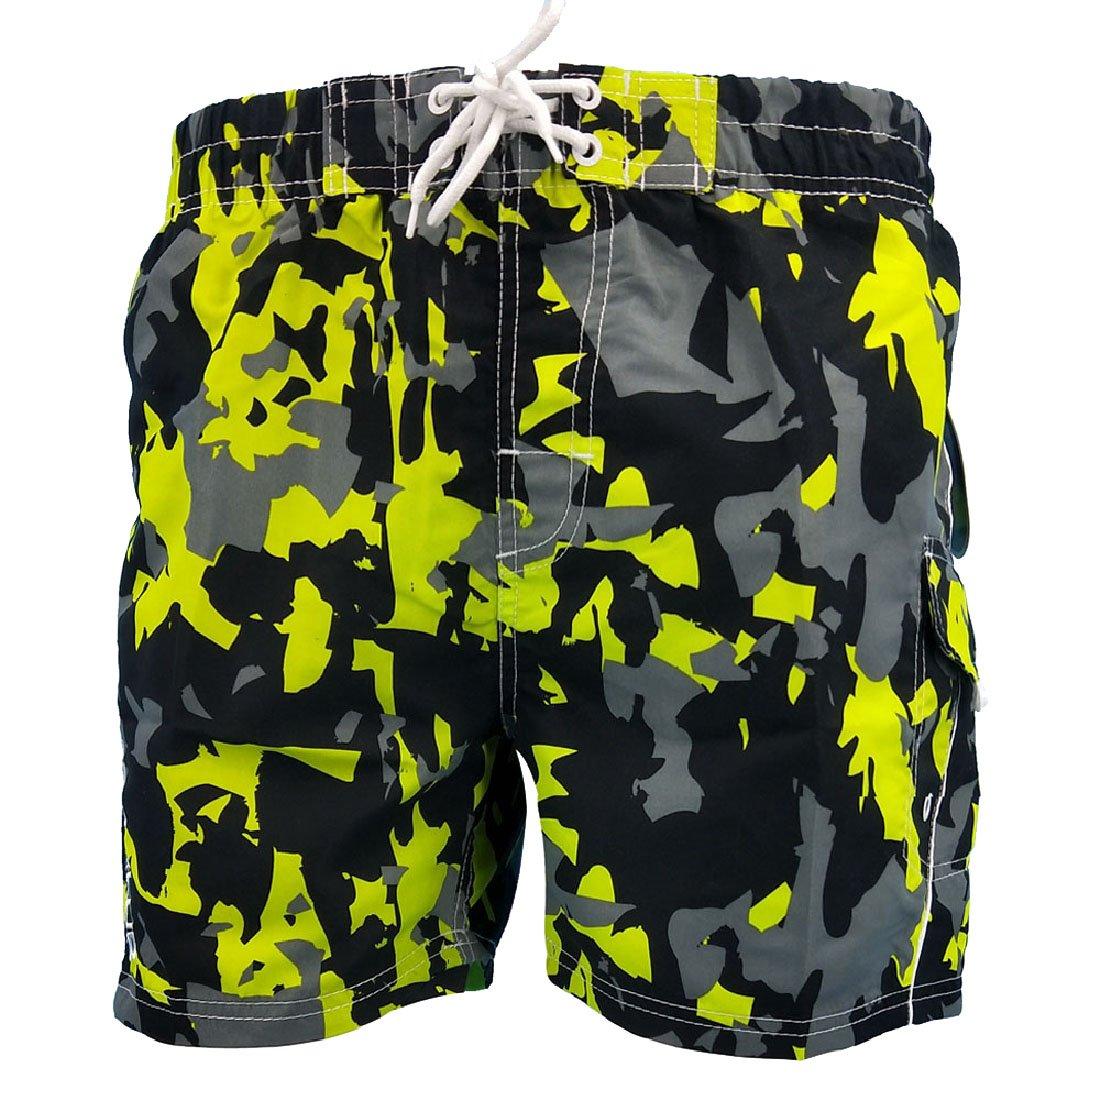 Tingwin Men Sports Casual Summer Multicamo Trunks Brief Swimsuit Swimwear